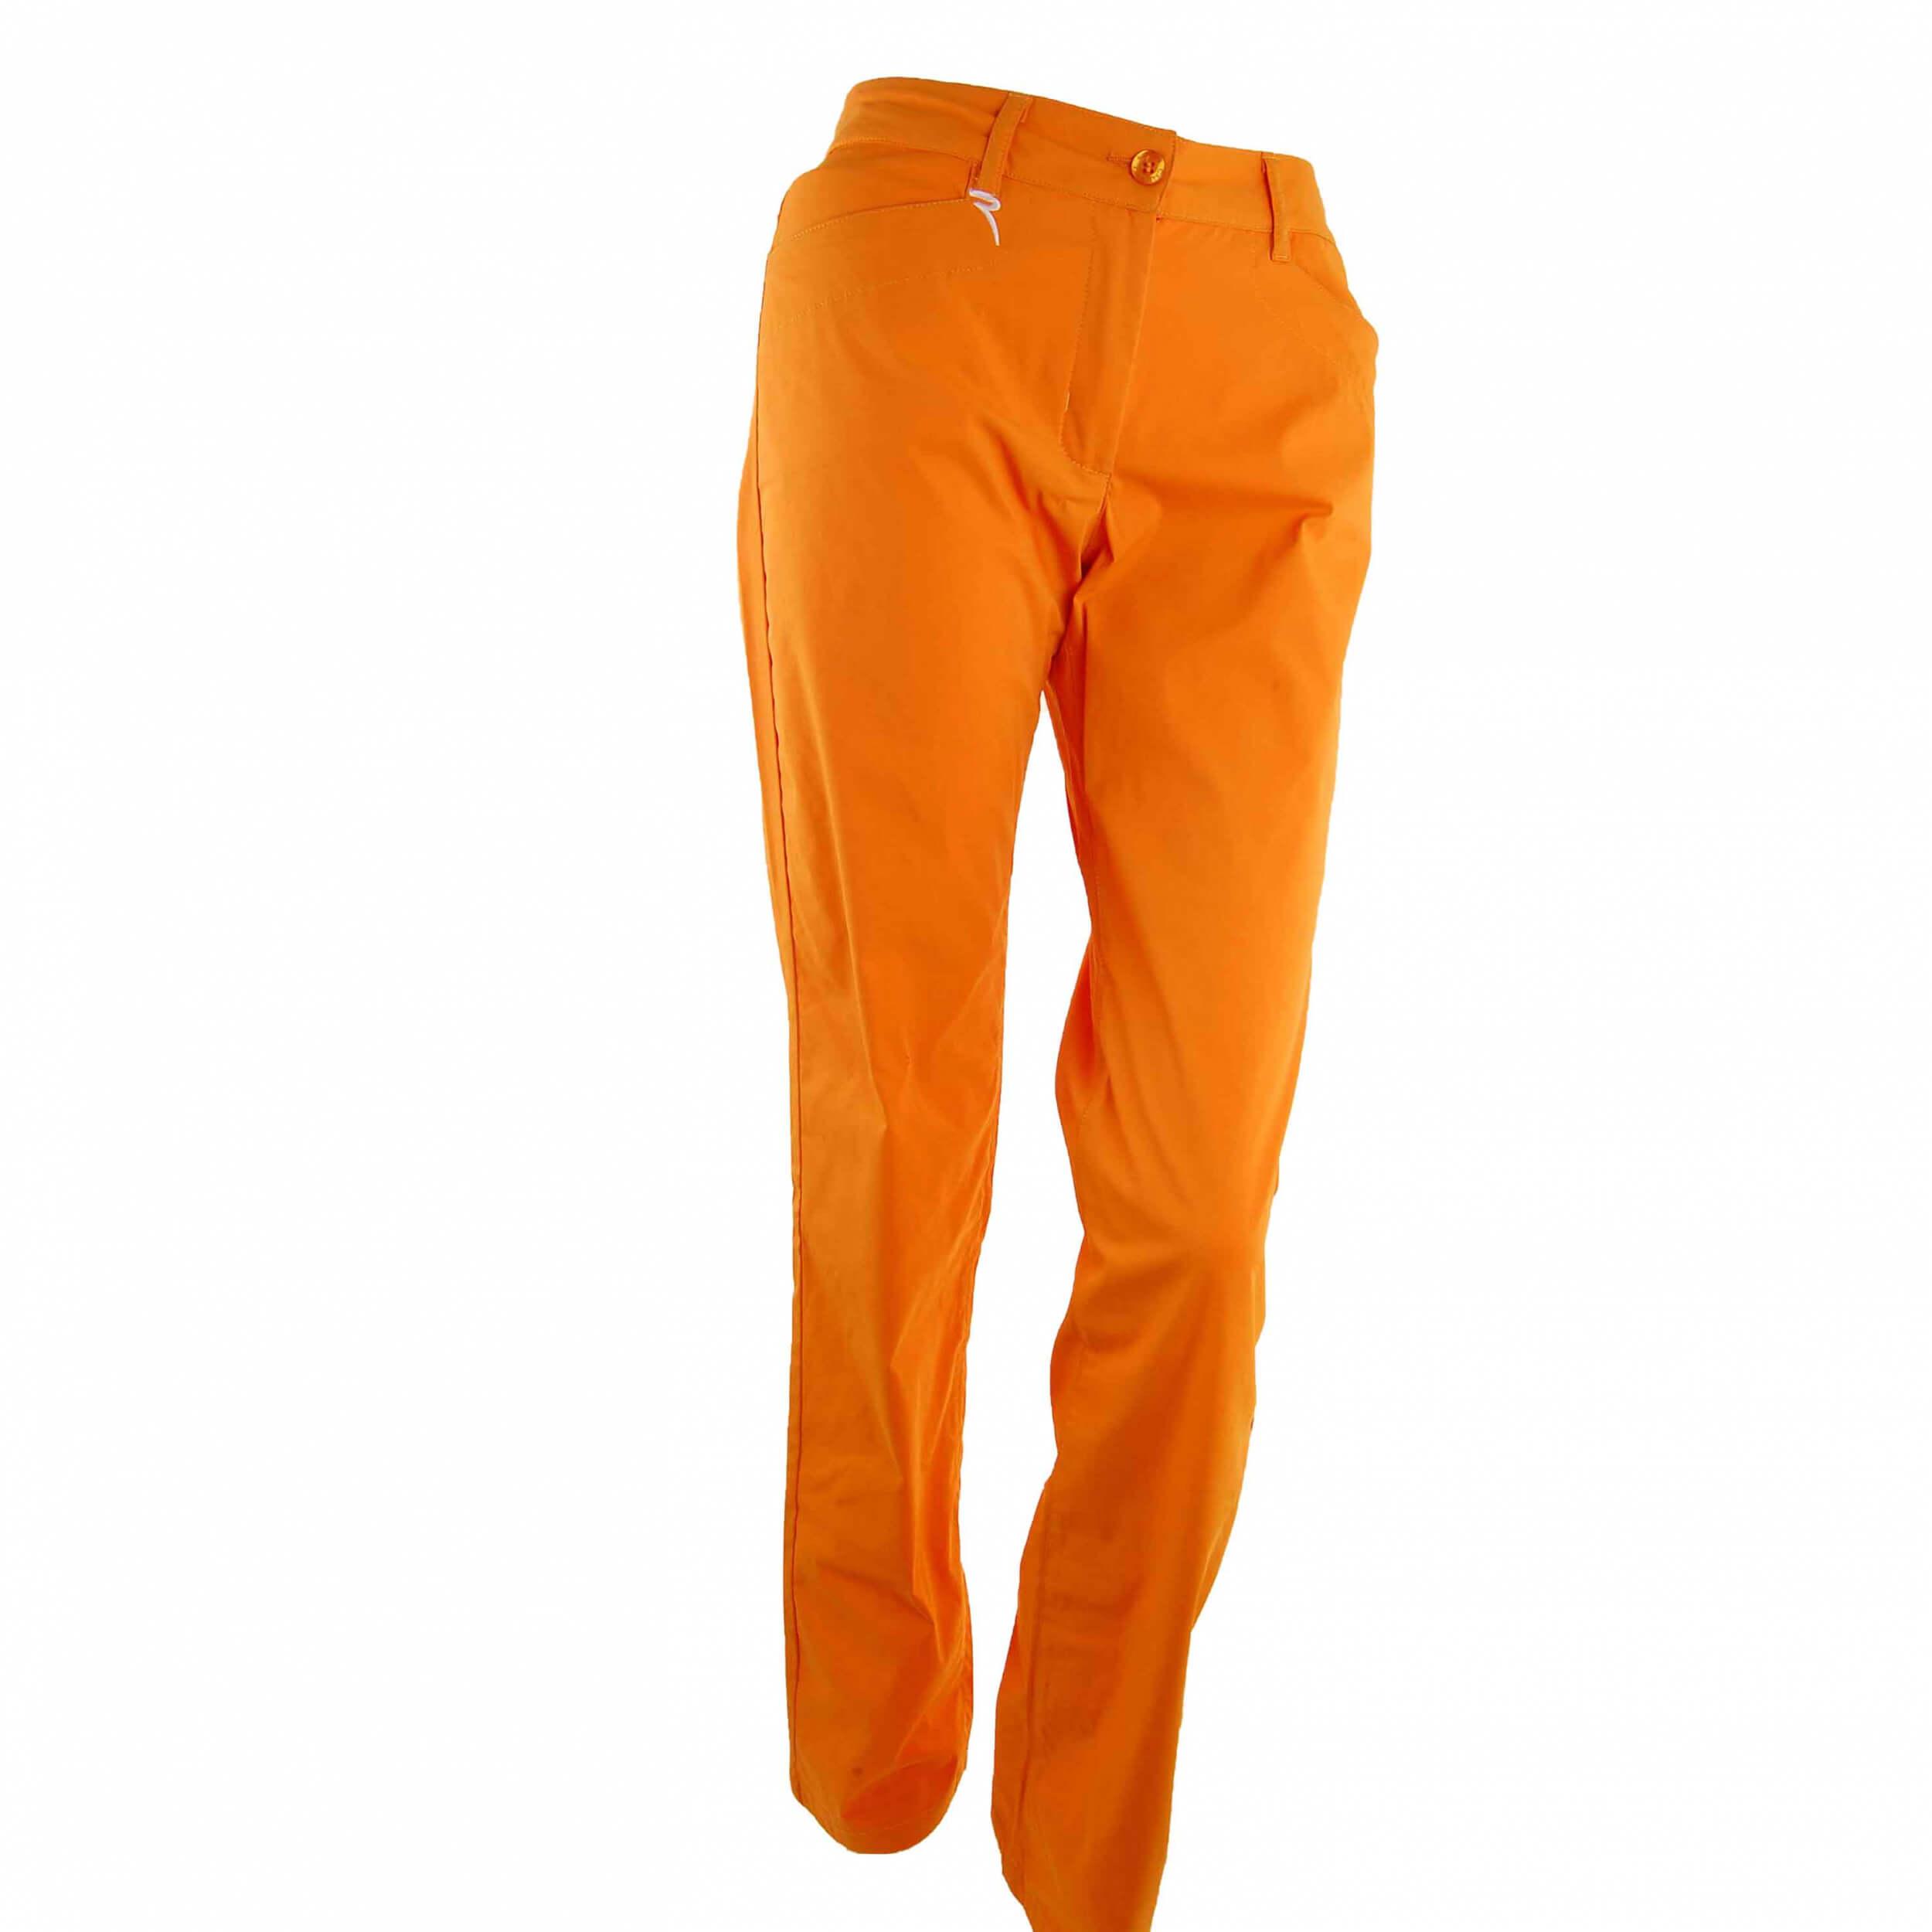 Chervo Damen Hose Sbrisa DRY MATIC orange 307 2.Wahl